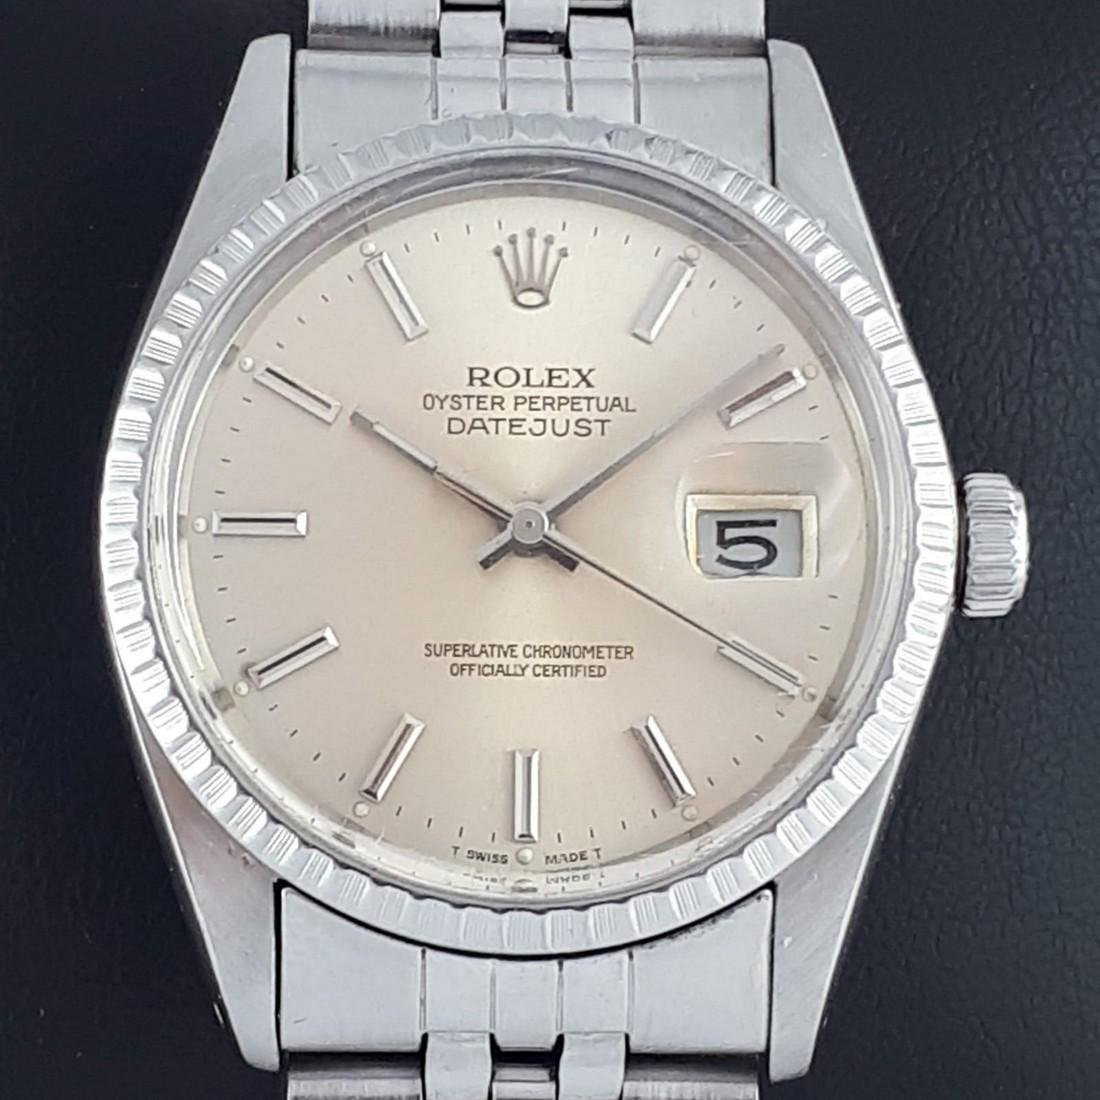 Rolex - Oyster Perpetual Datejust - ref: 16000 - Men -